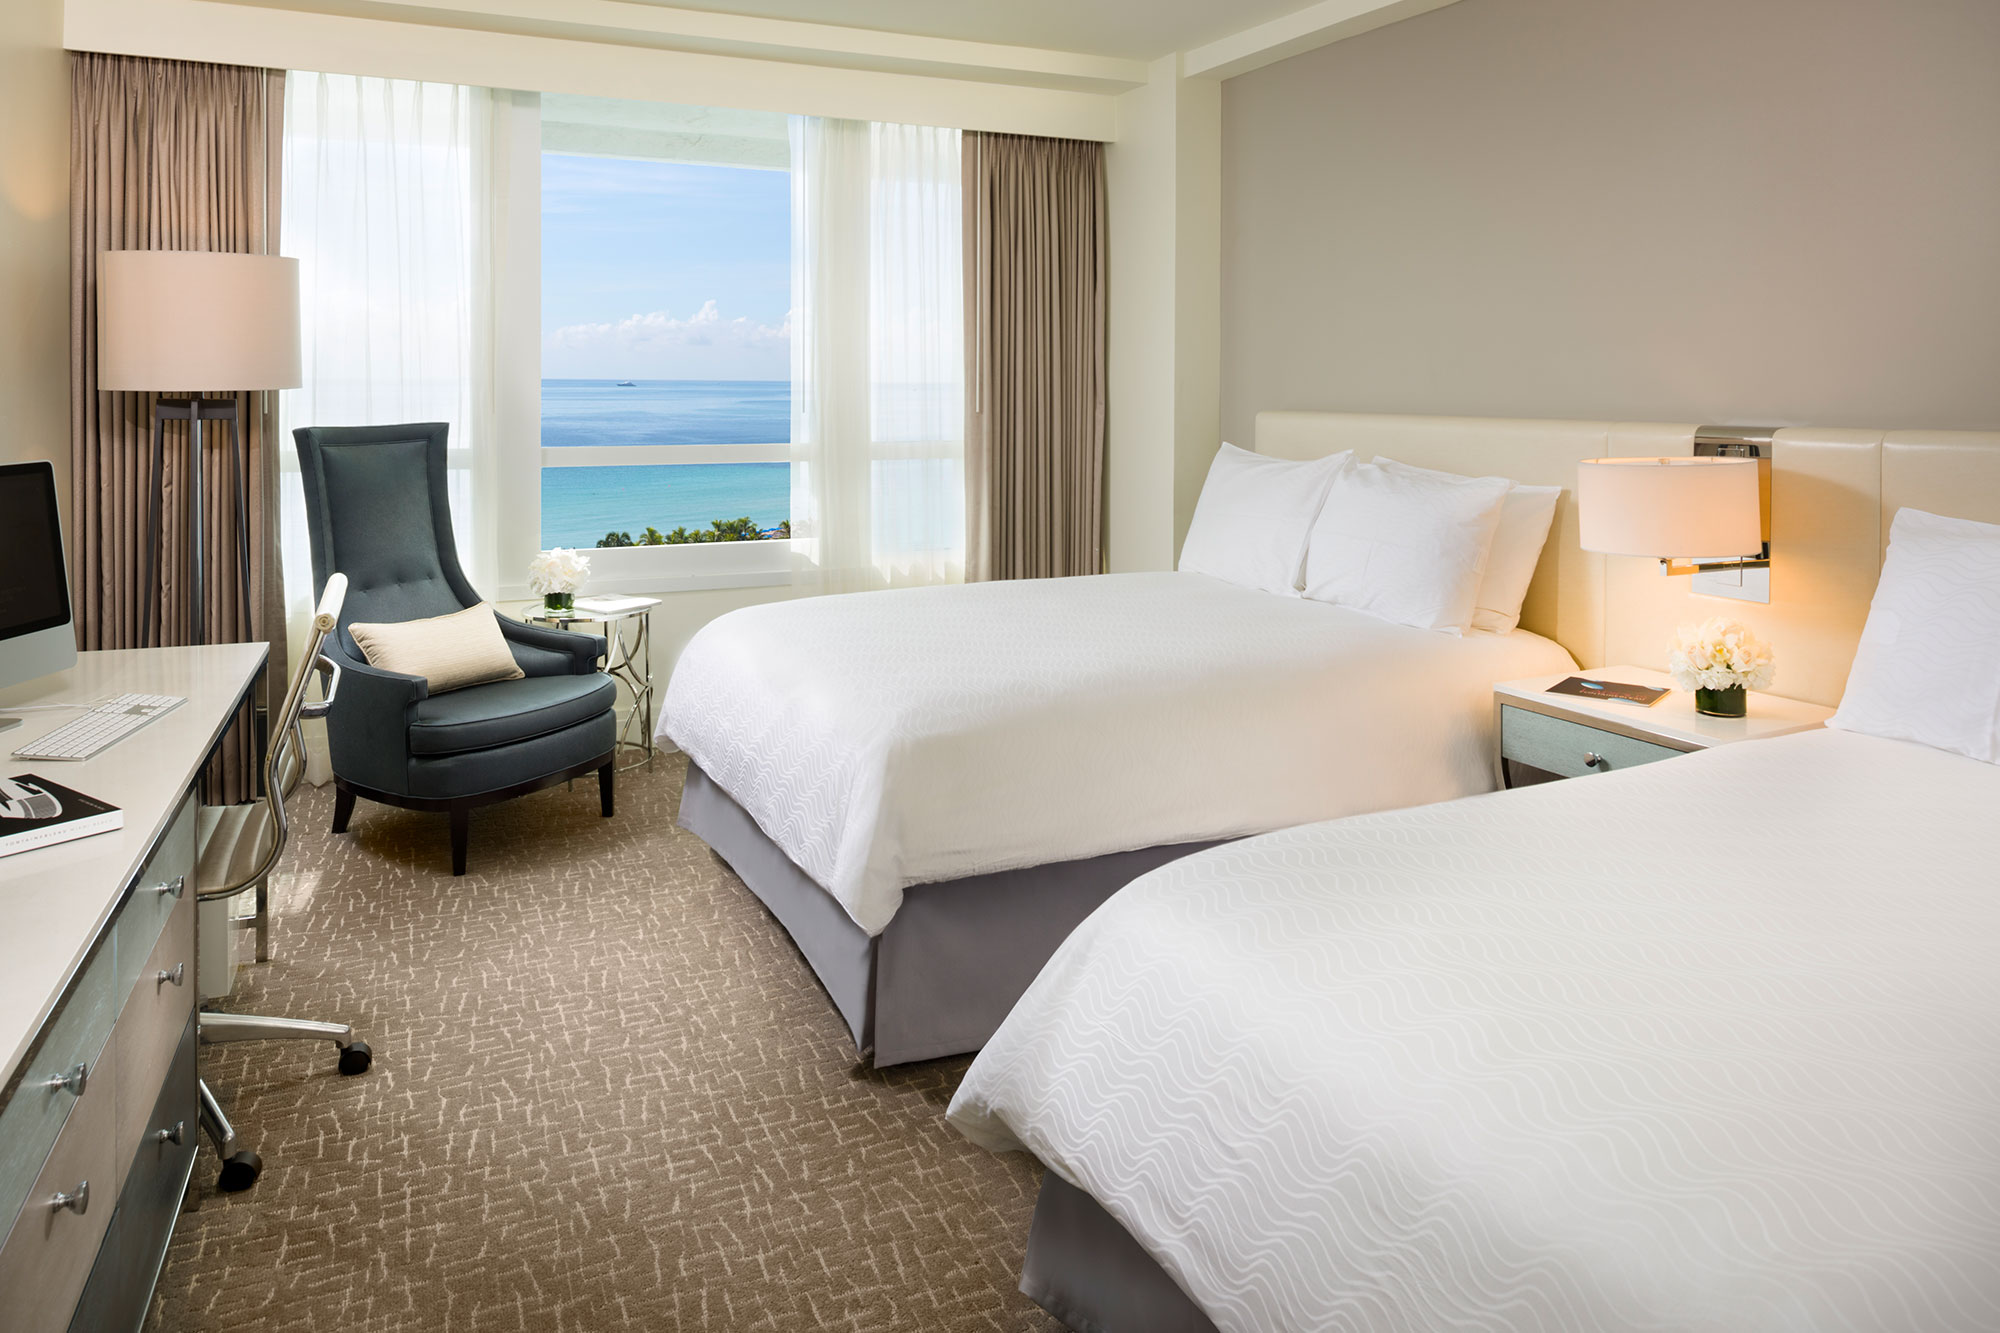 Ocean View Guestroom 1